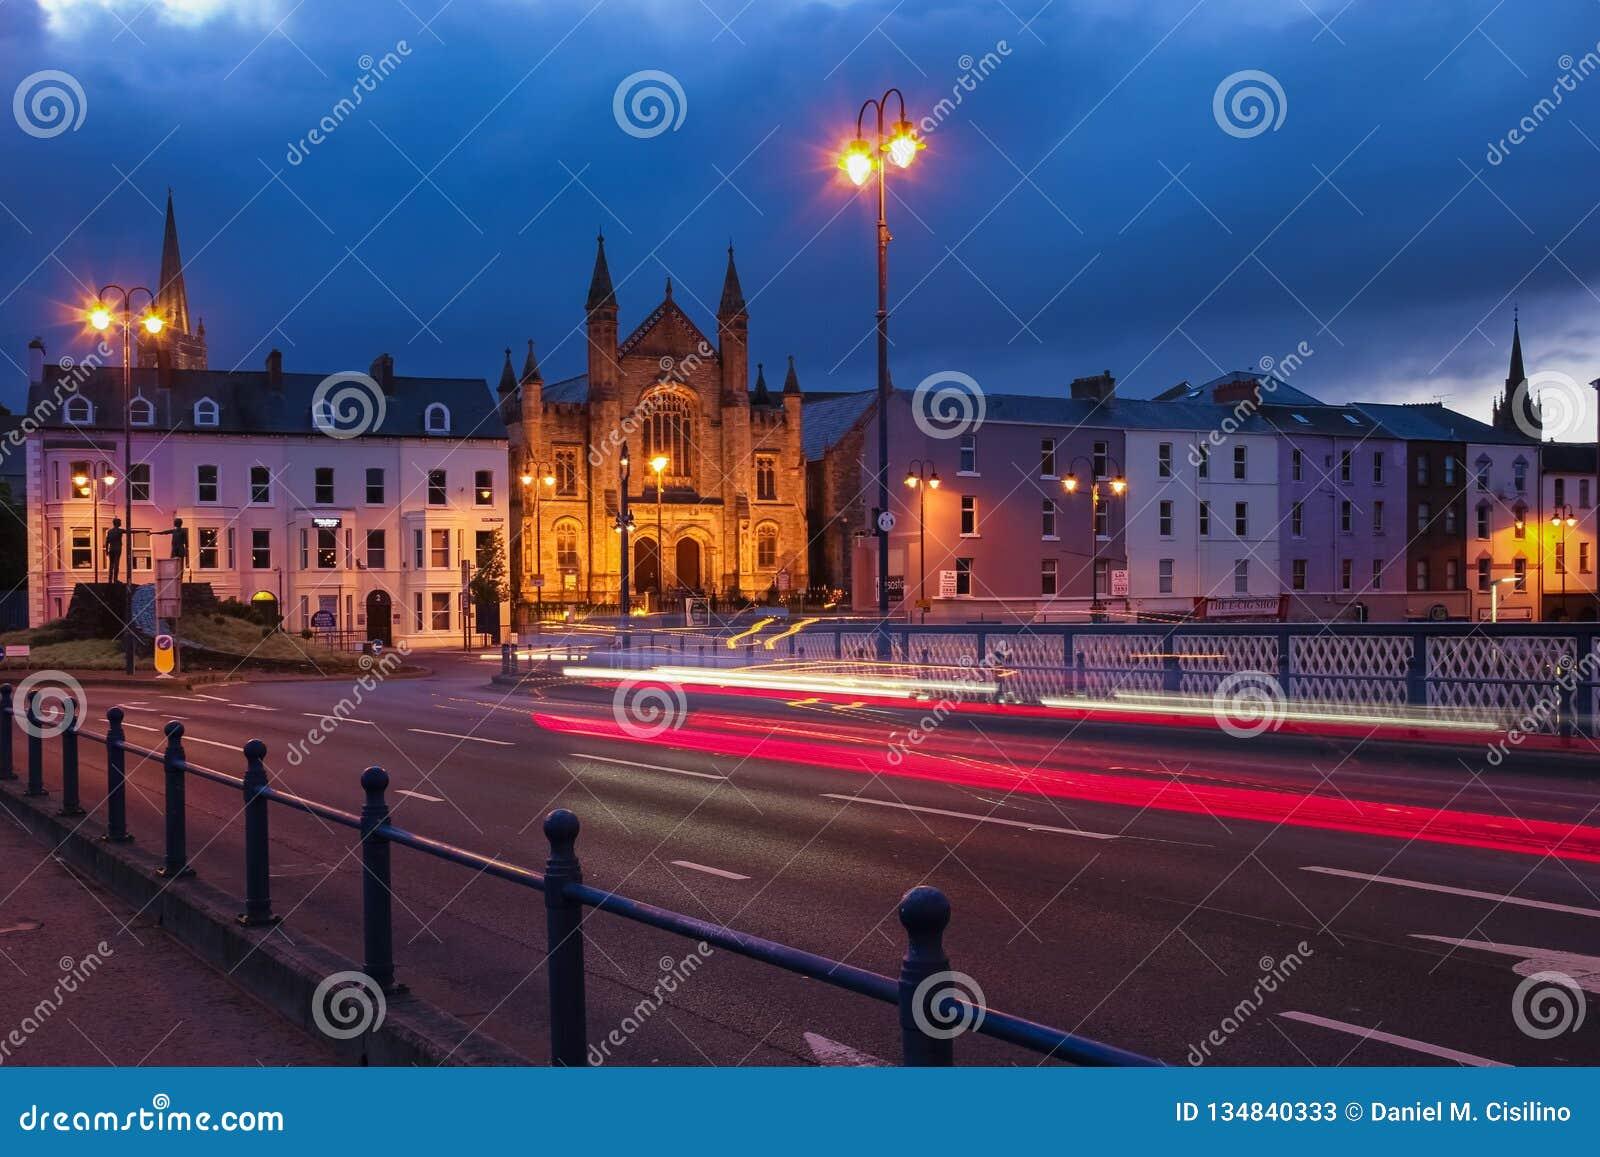 Night View. Derry Londonderry. Northern Ireland. United